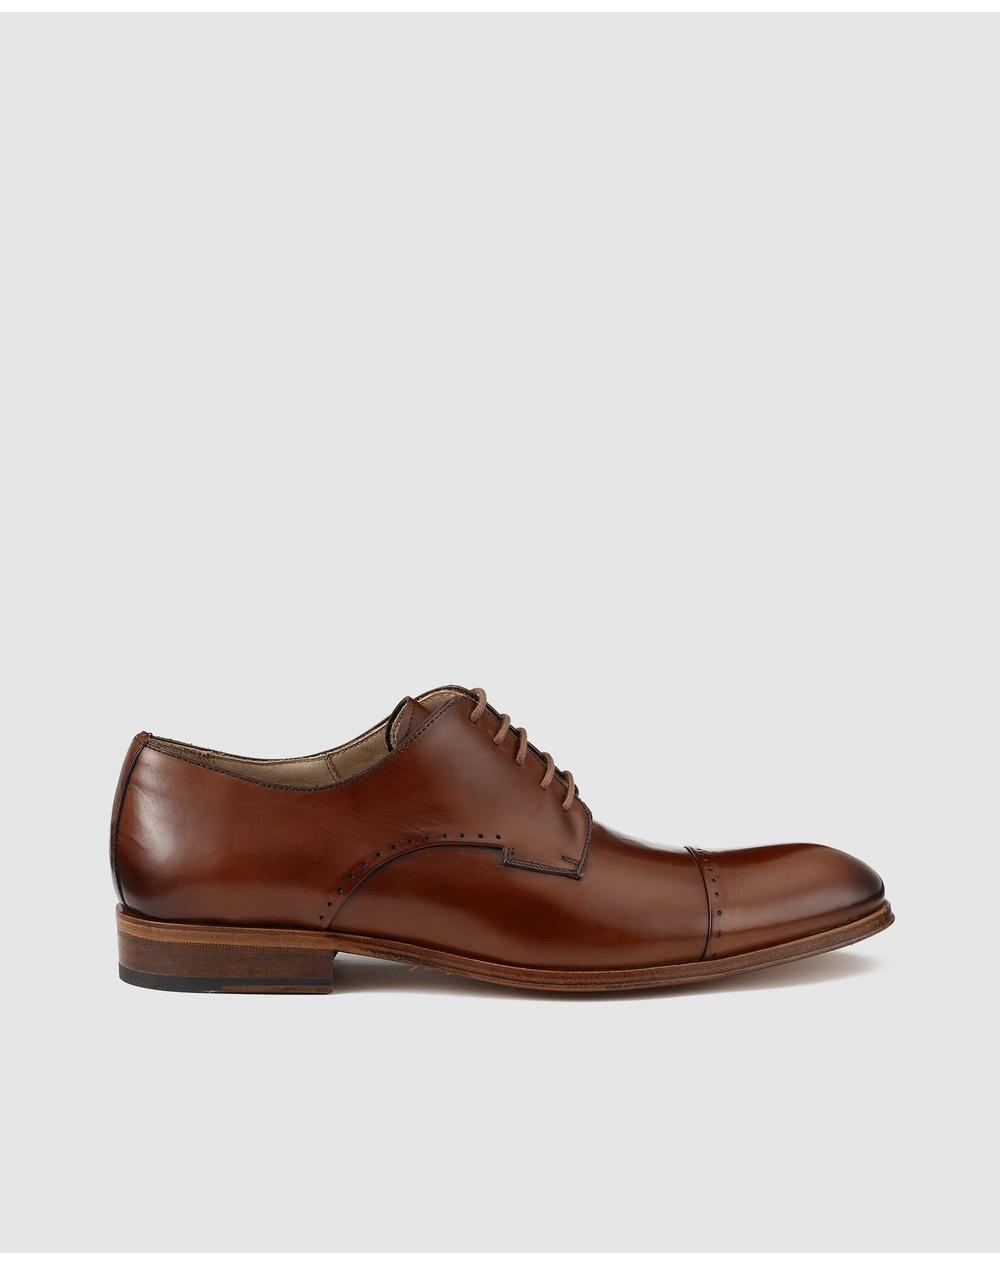 Chaussures-de-ville-homme-Roberto-Ley-en-cuir-bleu